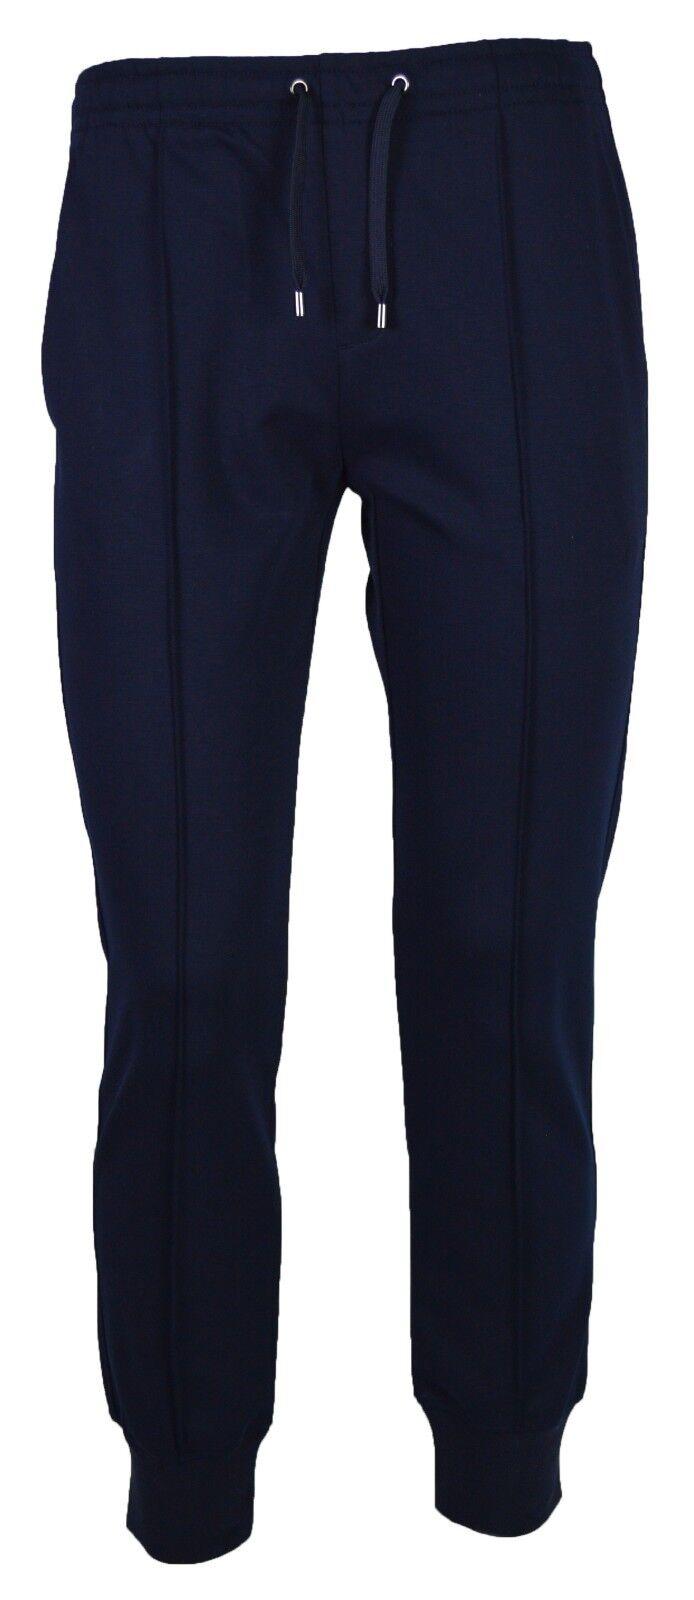 Emporio Armani Men`s Jogging Bottoms - S8N1PM5 - Blue Navy